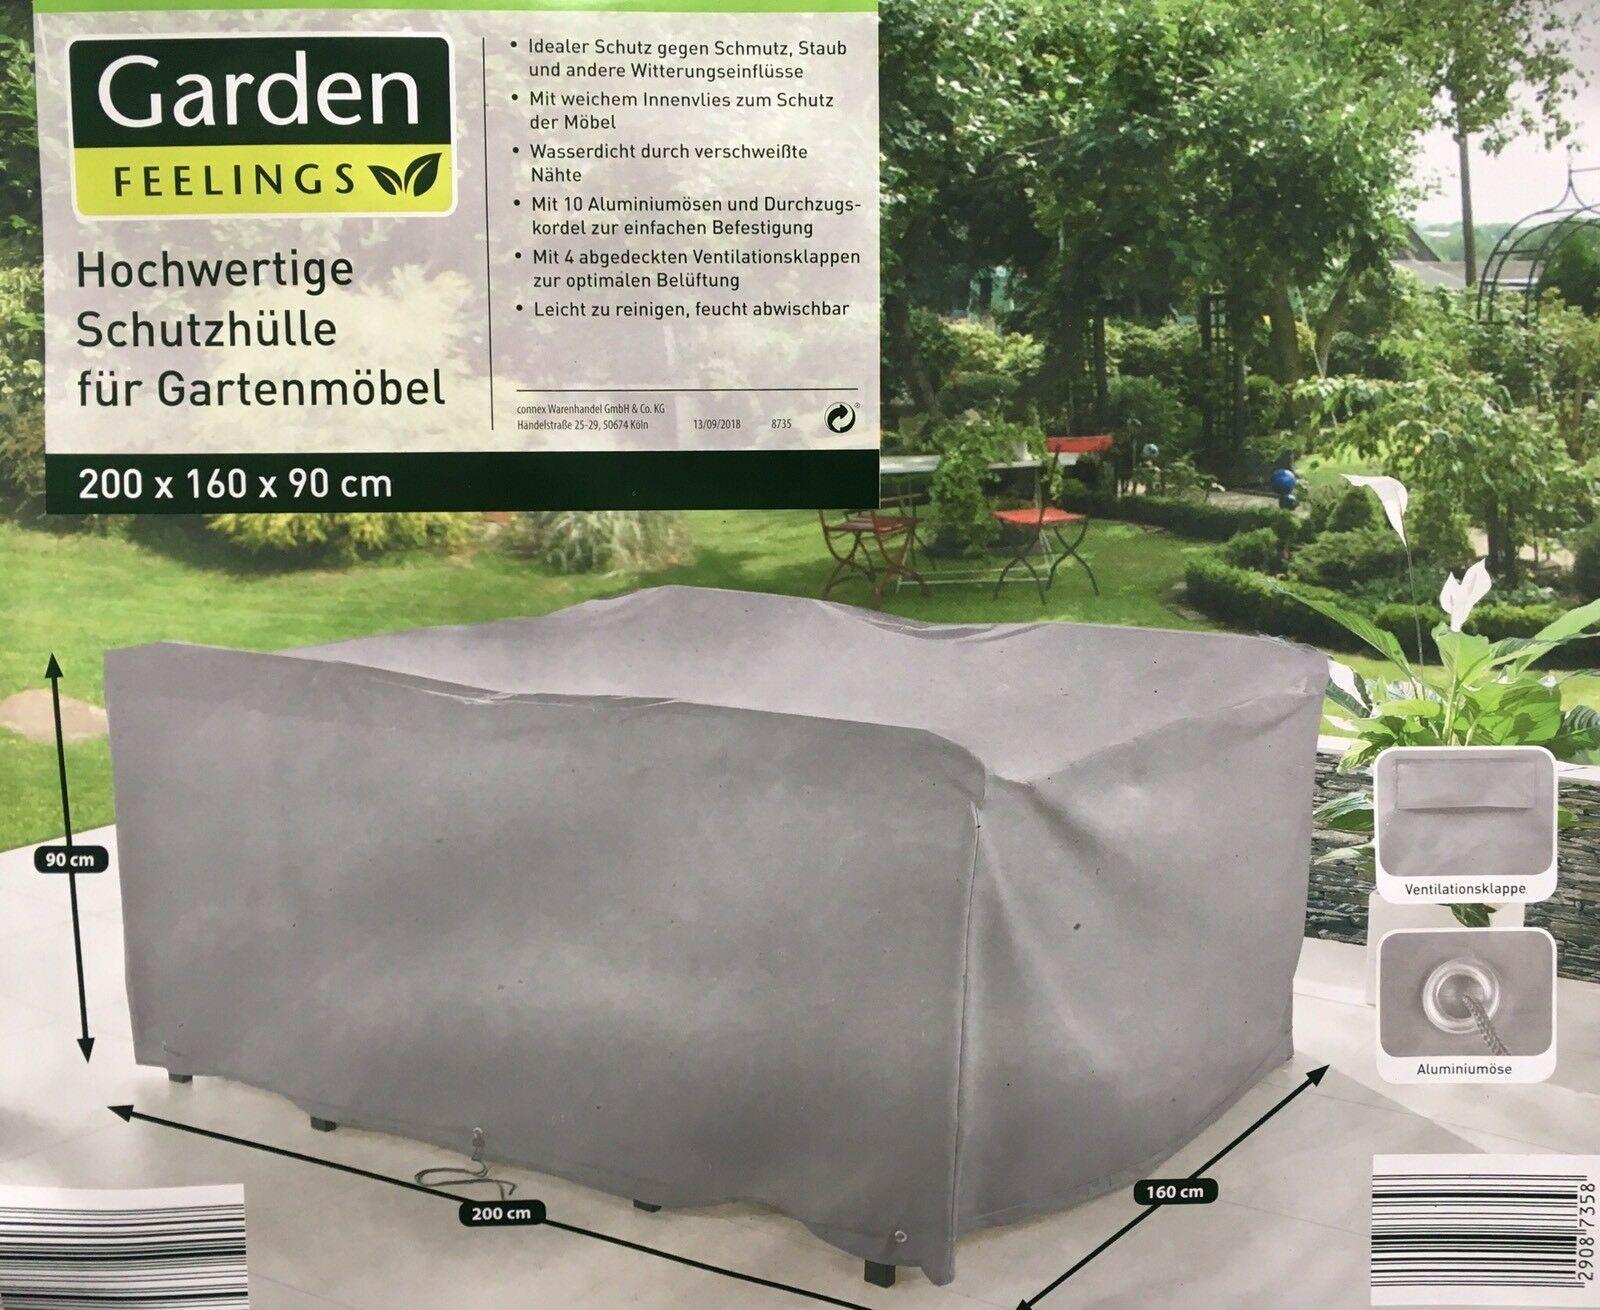 Aldi Garden Feelings Schutzhulle Fur Gartenmobel Billig Online Kaufen Wolle Kaufen Aldi Gartenmobel